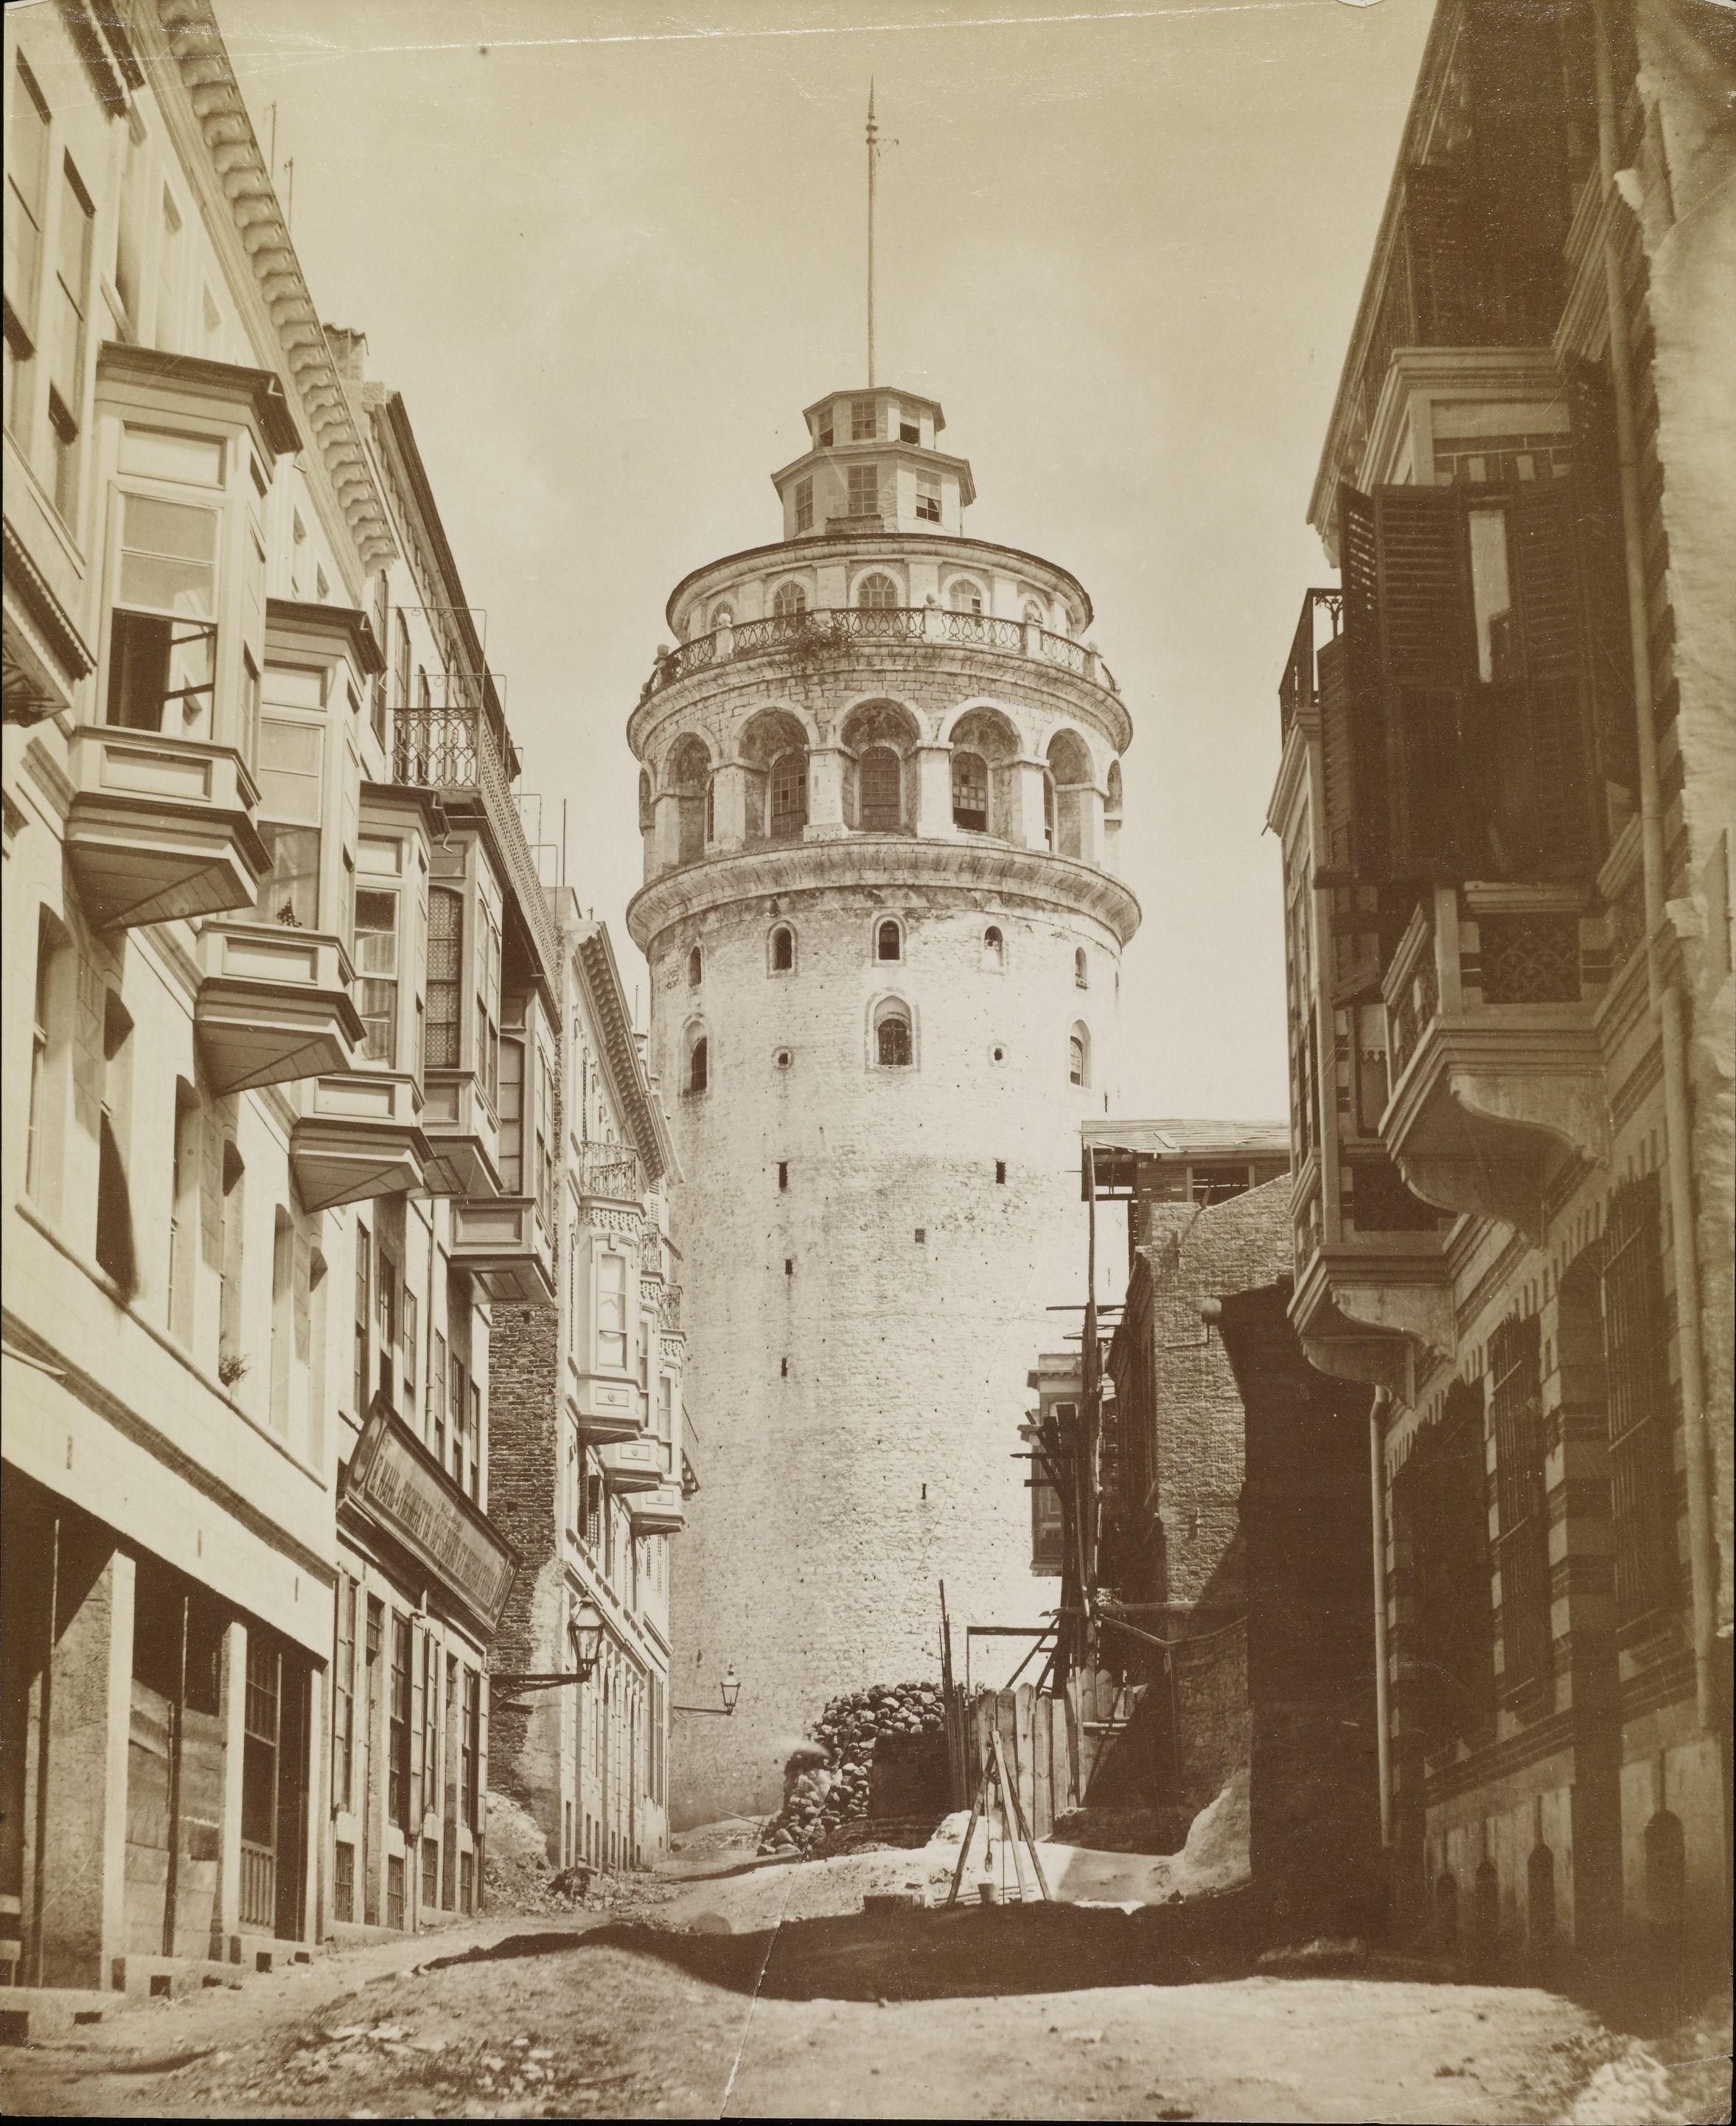 buyukhendek caddesi nden galata kulesi abdullah freres fotografi eski istanbul fotograflari arsivi istanbul fotograf hagia sophia